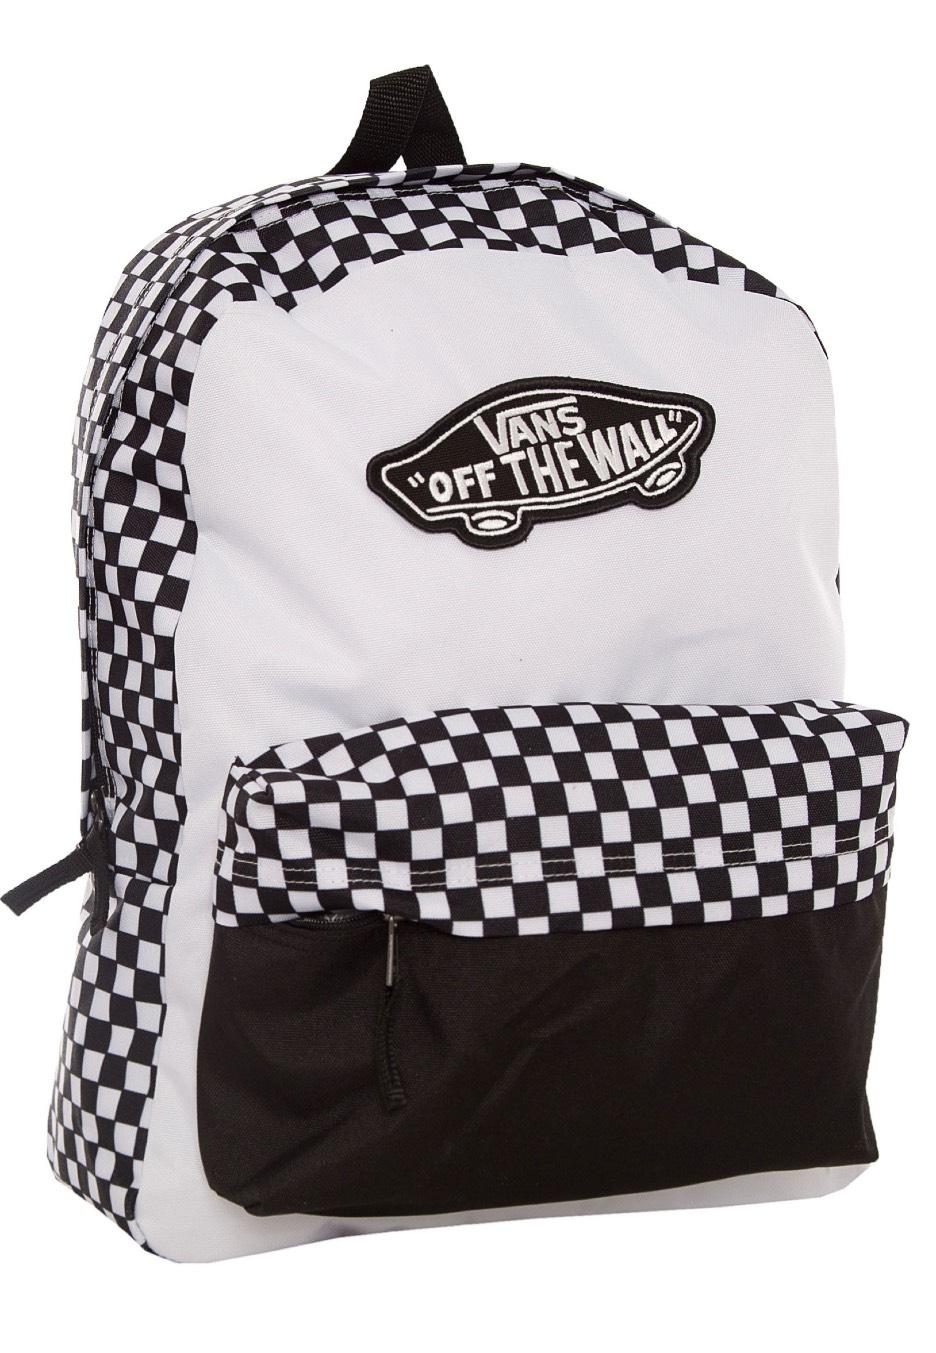 3794ba5812b Vans - Realm Black/White - Backpack - Impericon.com Worldwide